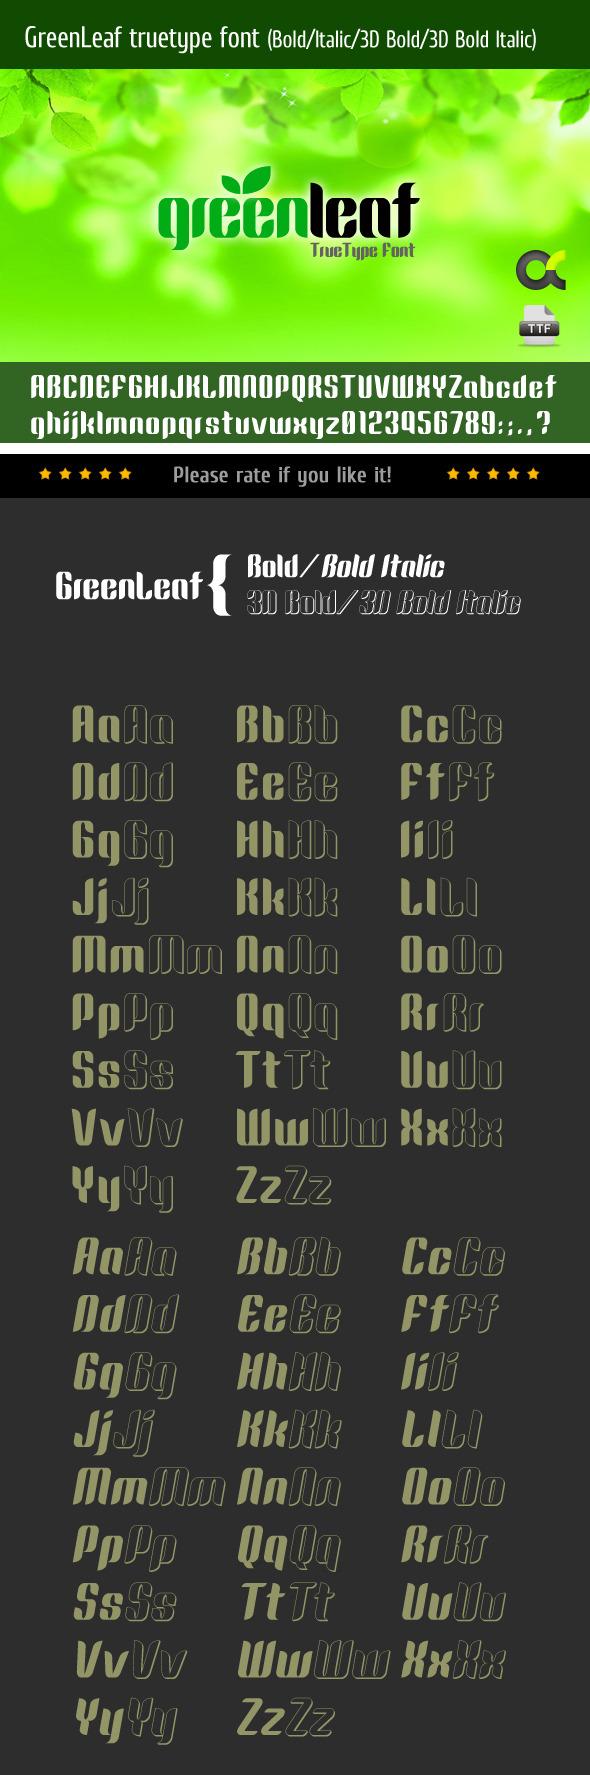 GreenLeaf TrueType Font - Sans-Serif Fonts